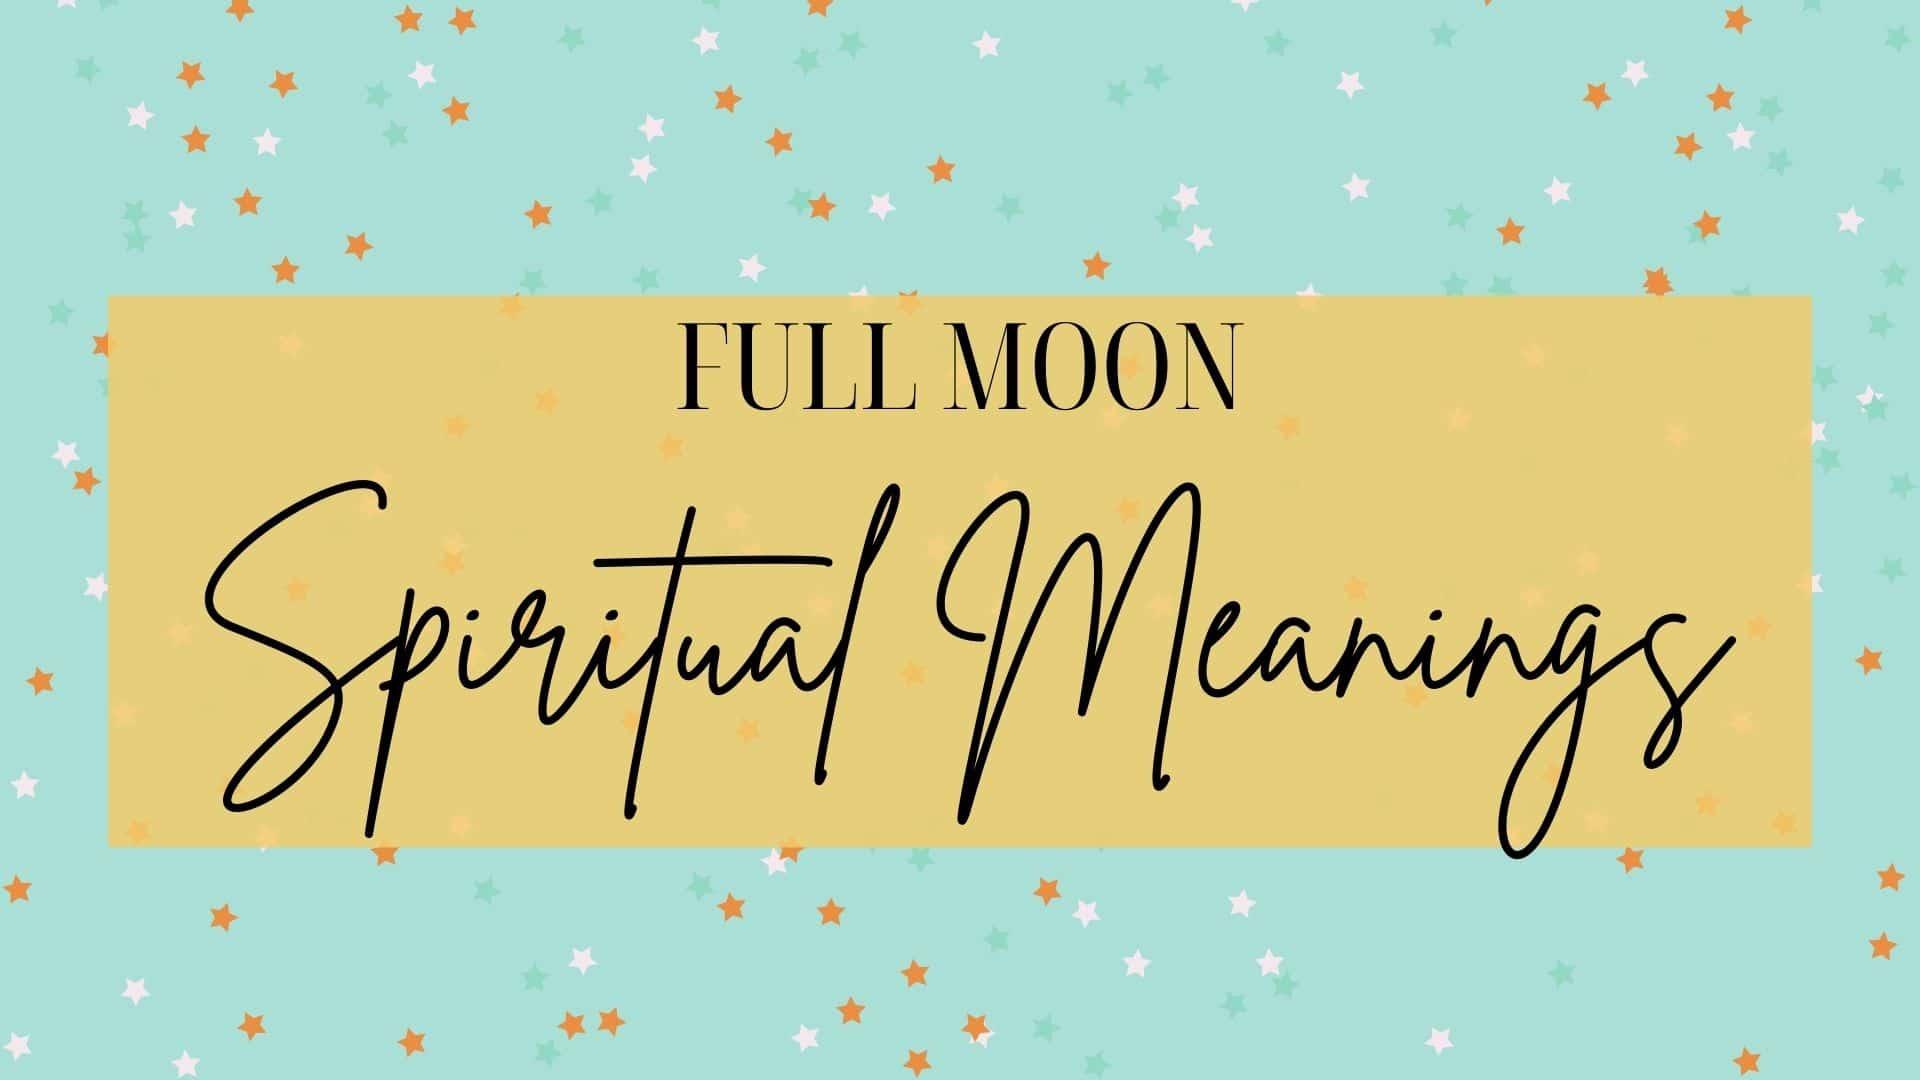 Full Moon Spiritual Meanings